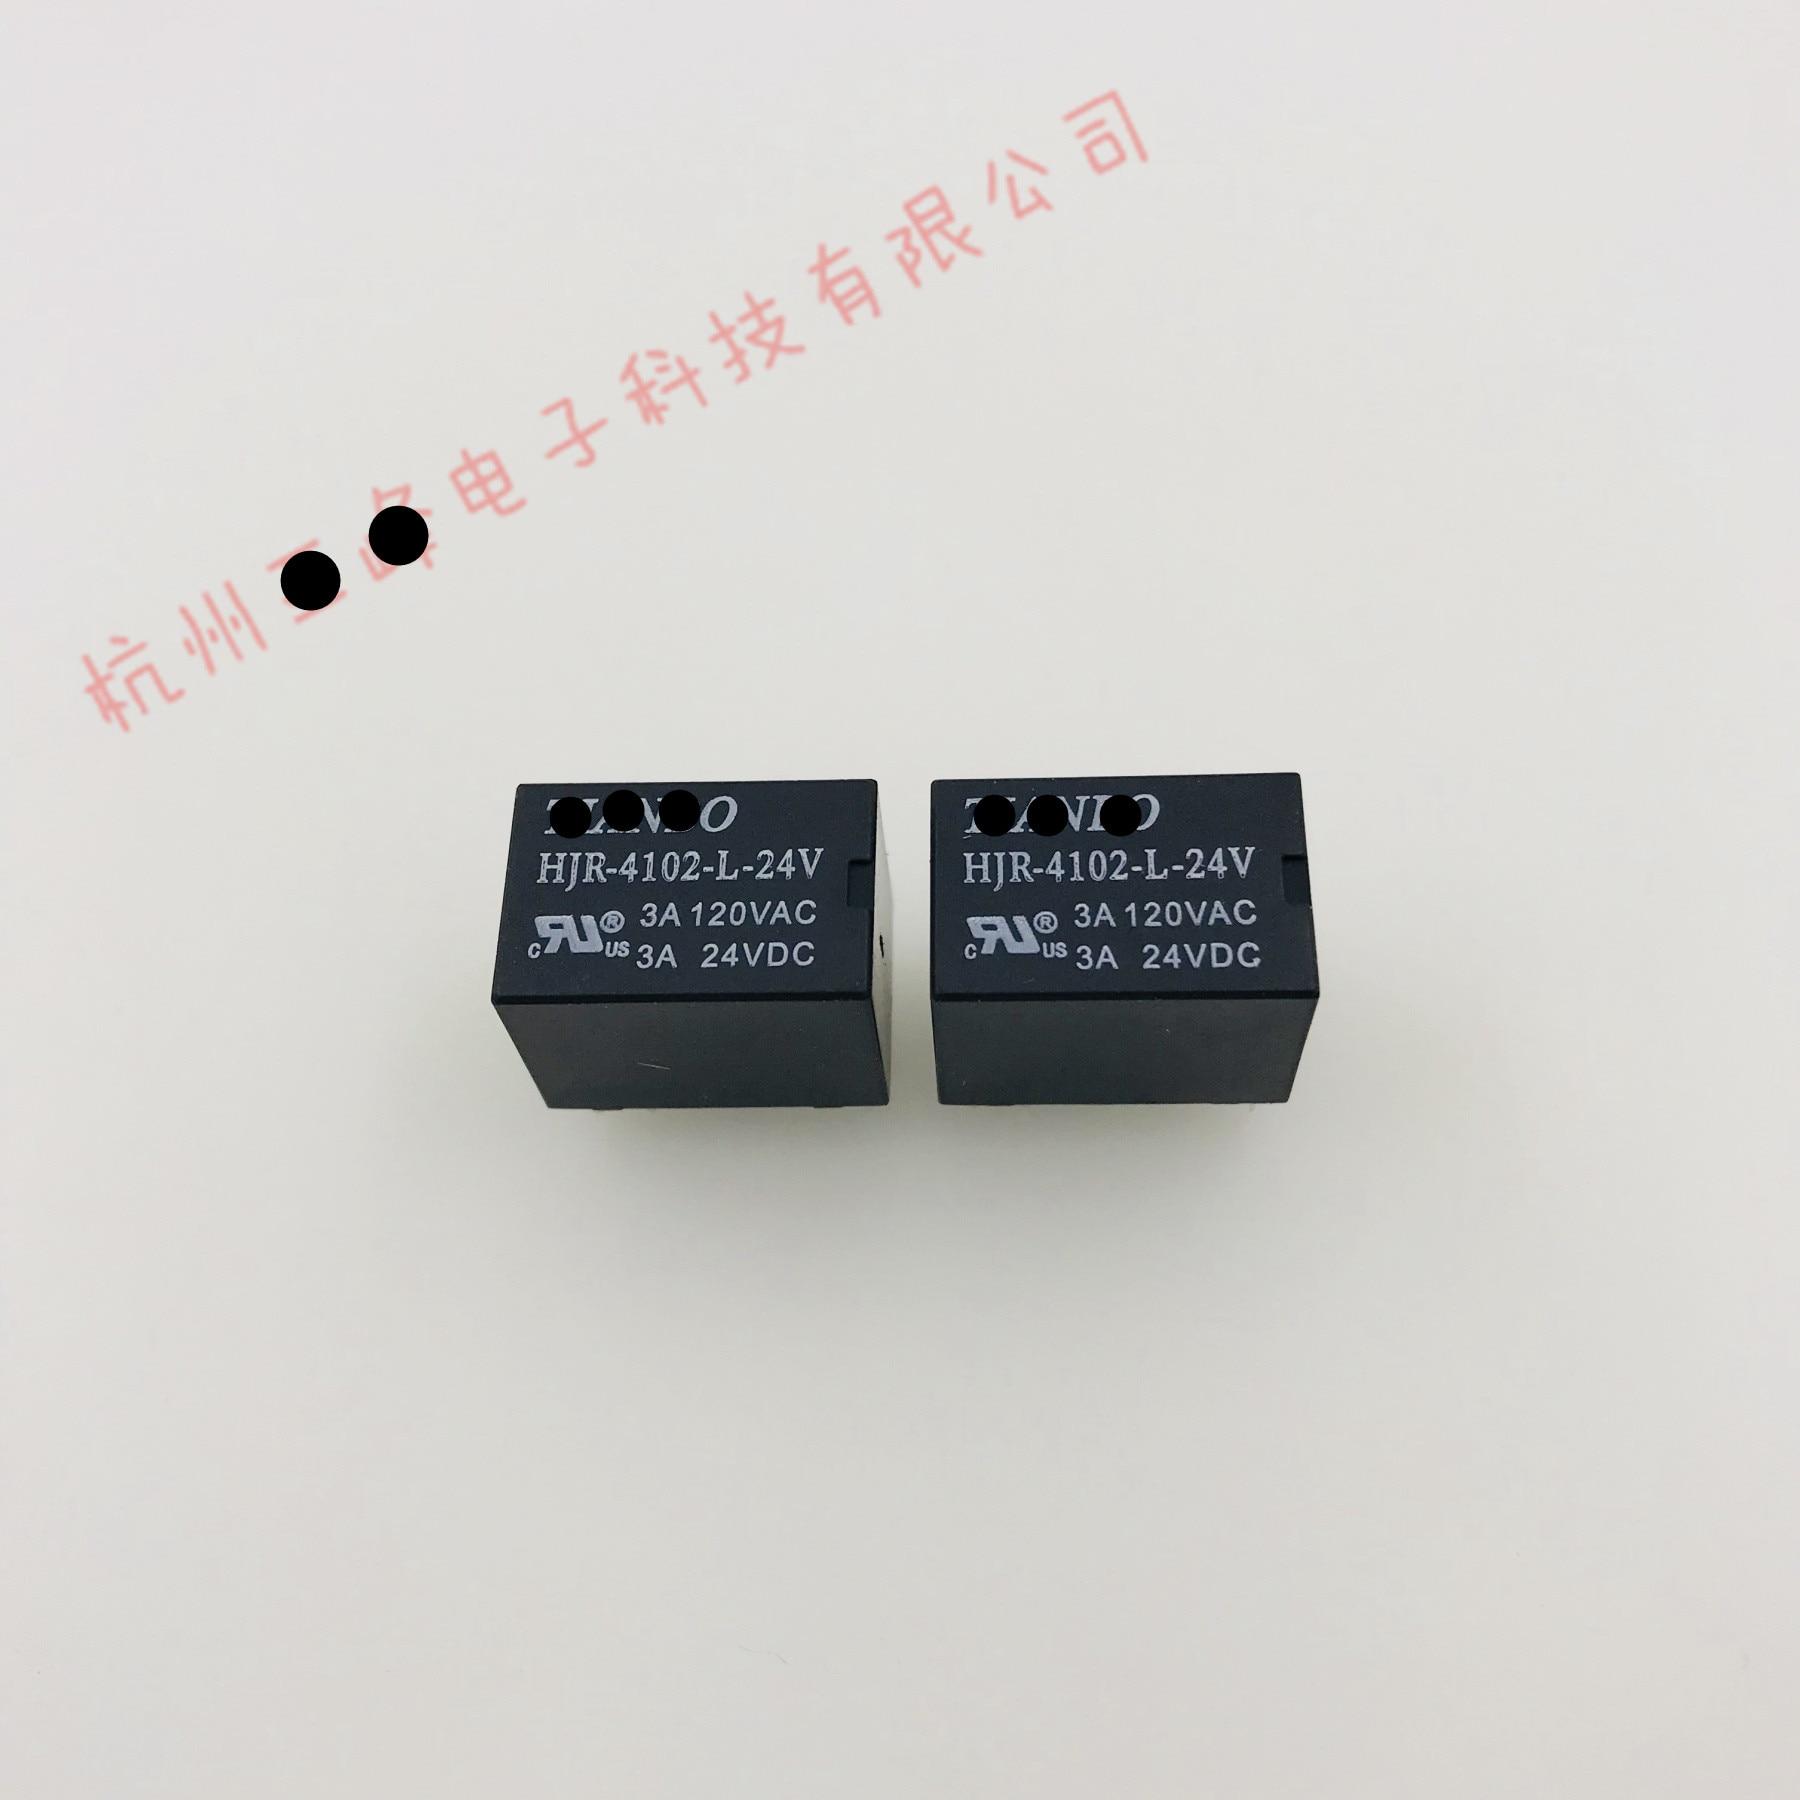 (10 peça) HJR-4102-L-05V HJR-4102-L-12V HJR-4102-L-24V 6 pinos 3a relé de sinal novo